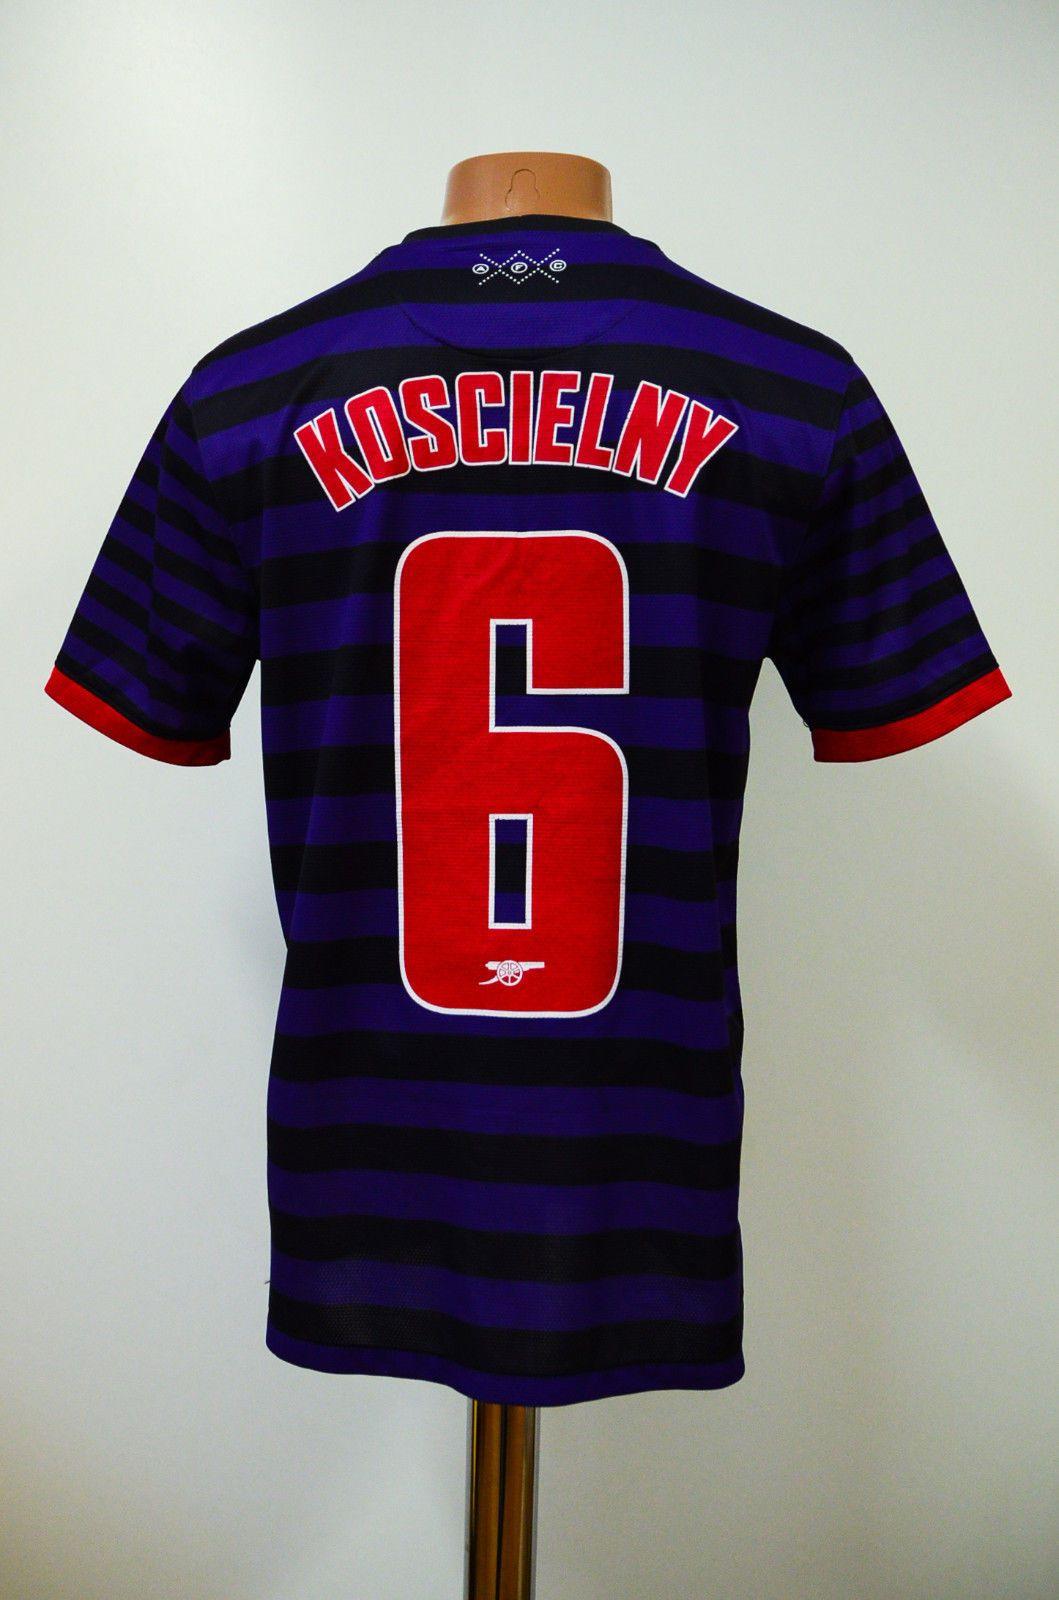 arsenal london 20122013 away football shirt jersey maglia nike koscielny